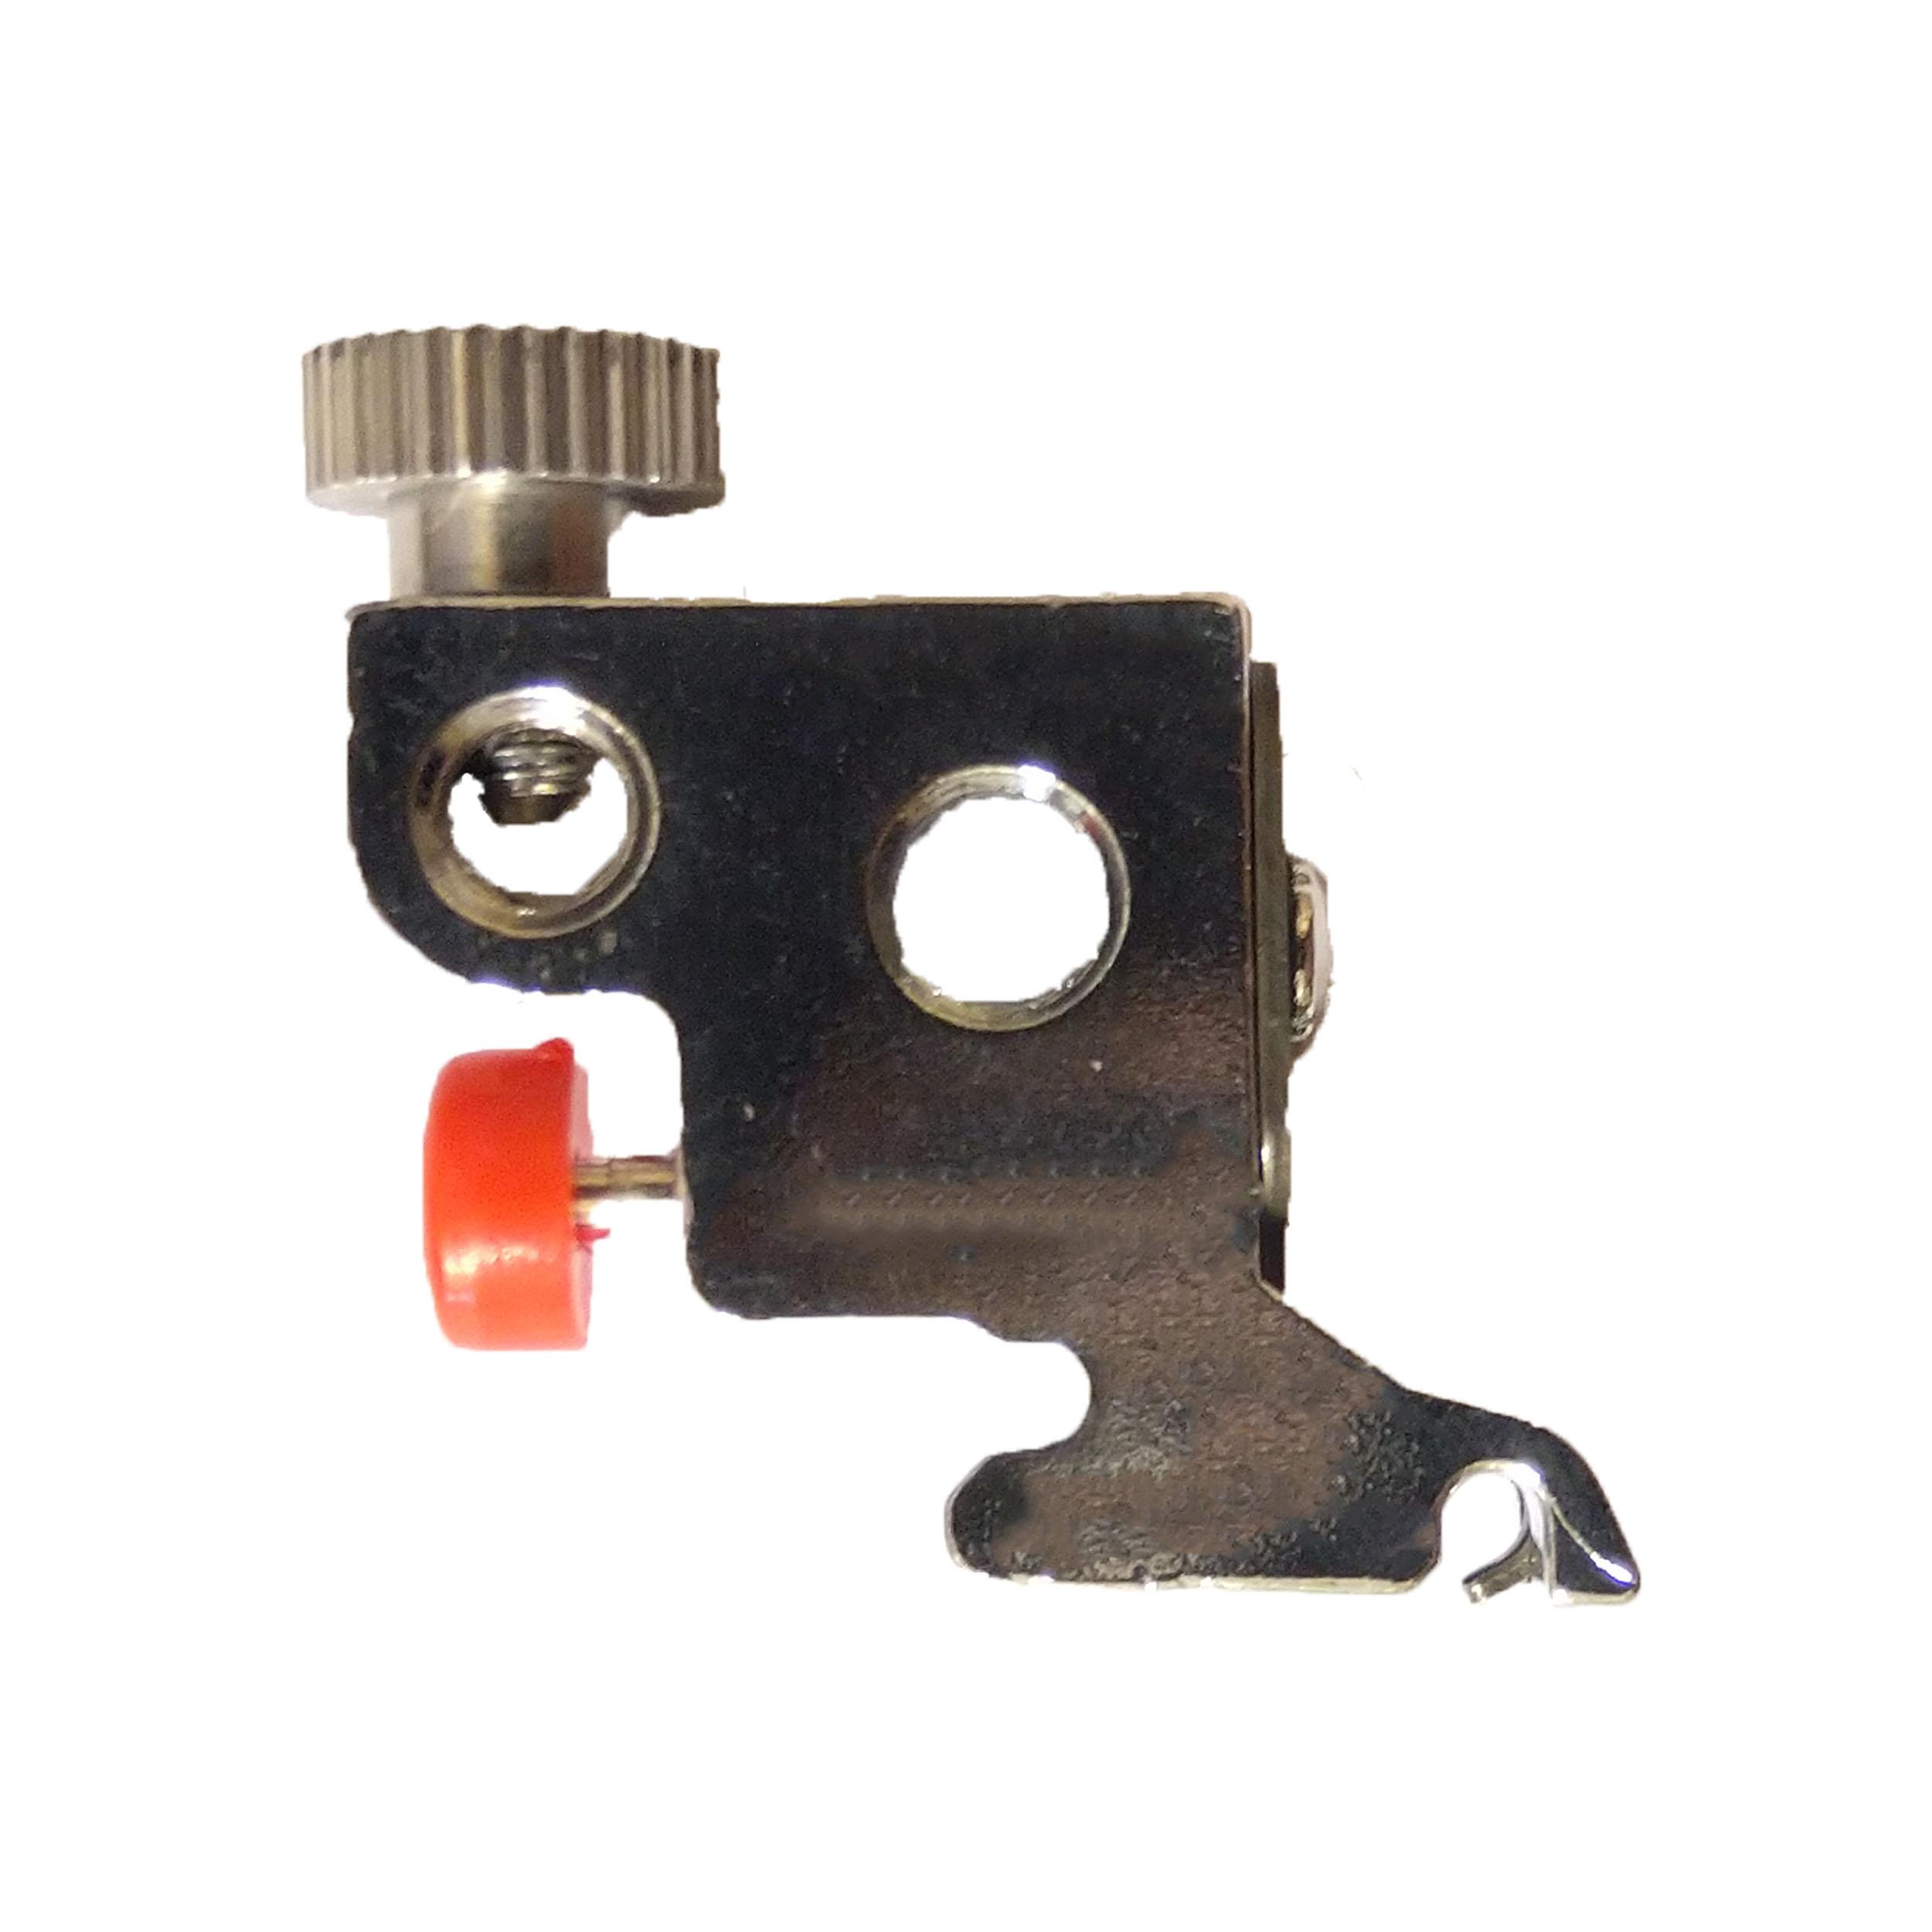 قیمت                      بکس پایه چرخ خیاطی مدل a802